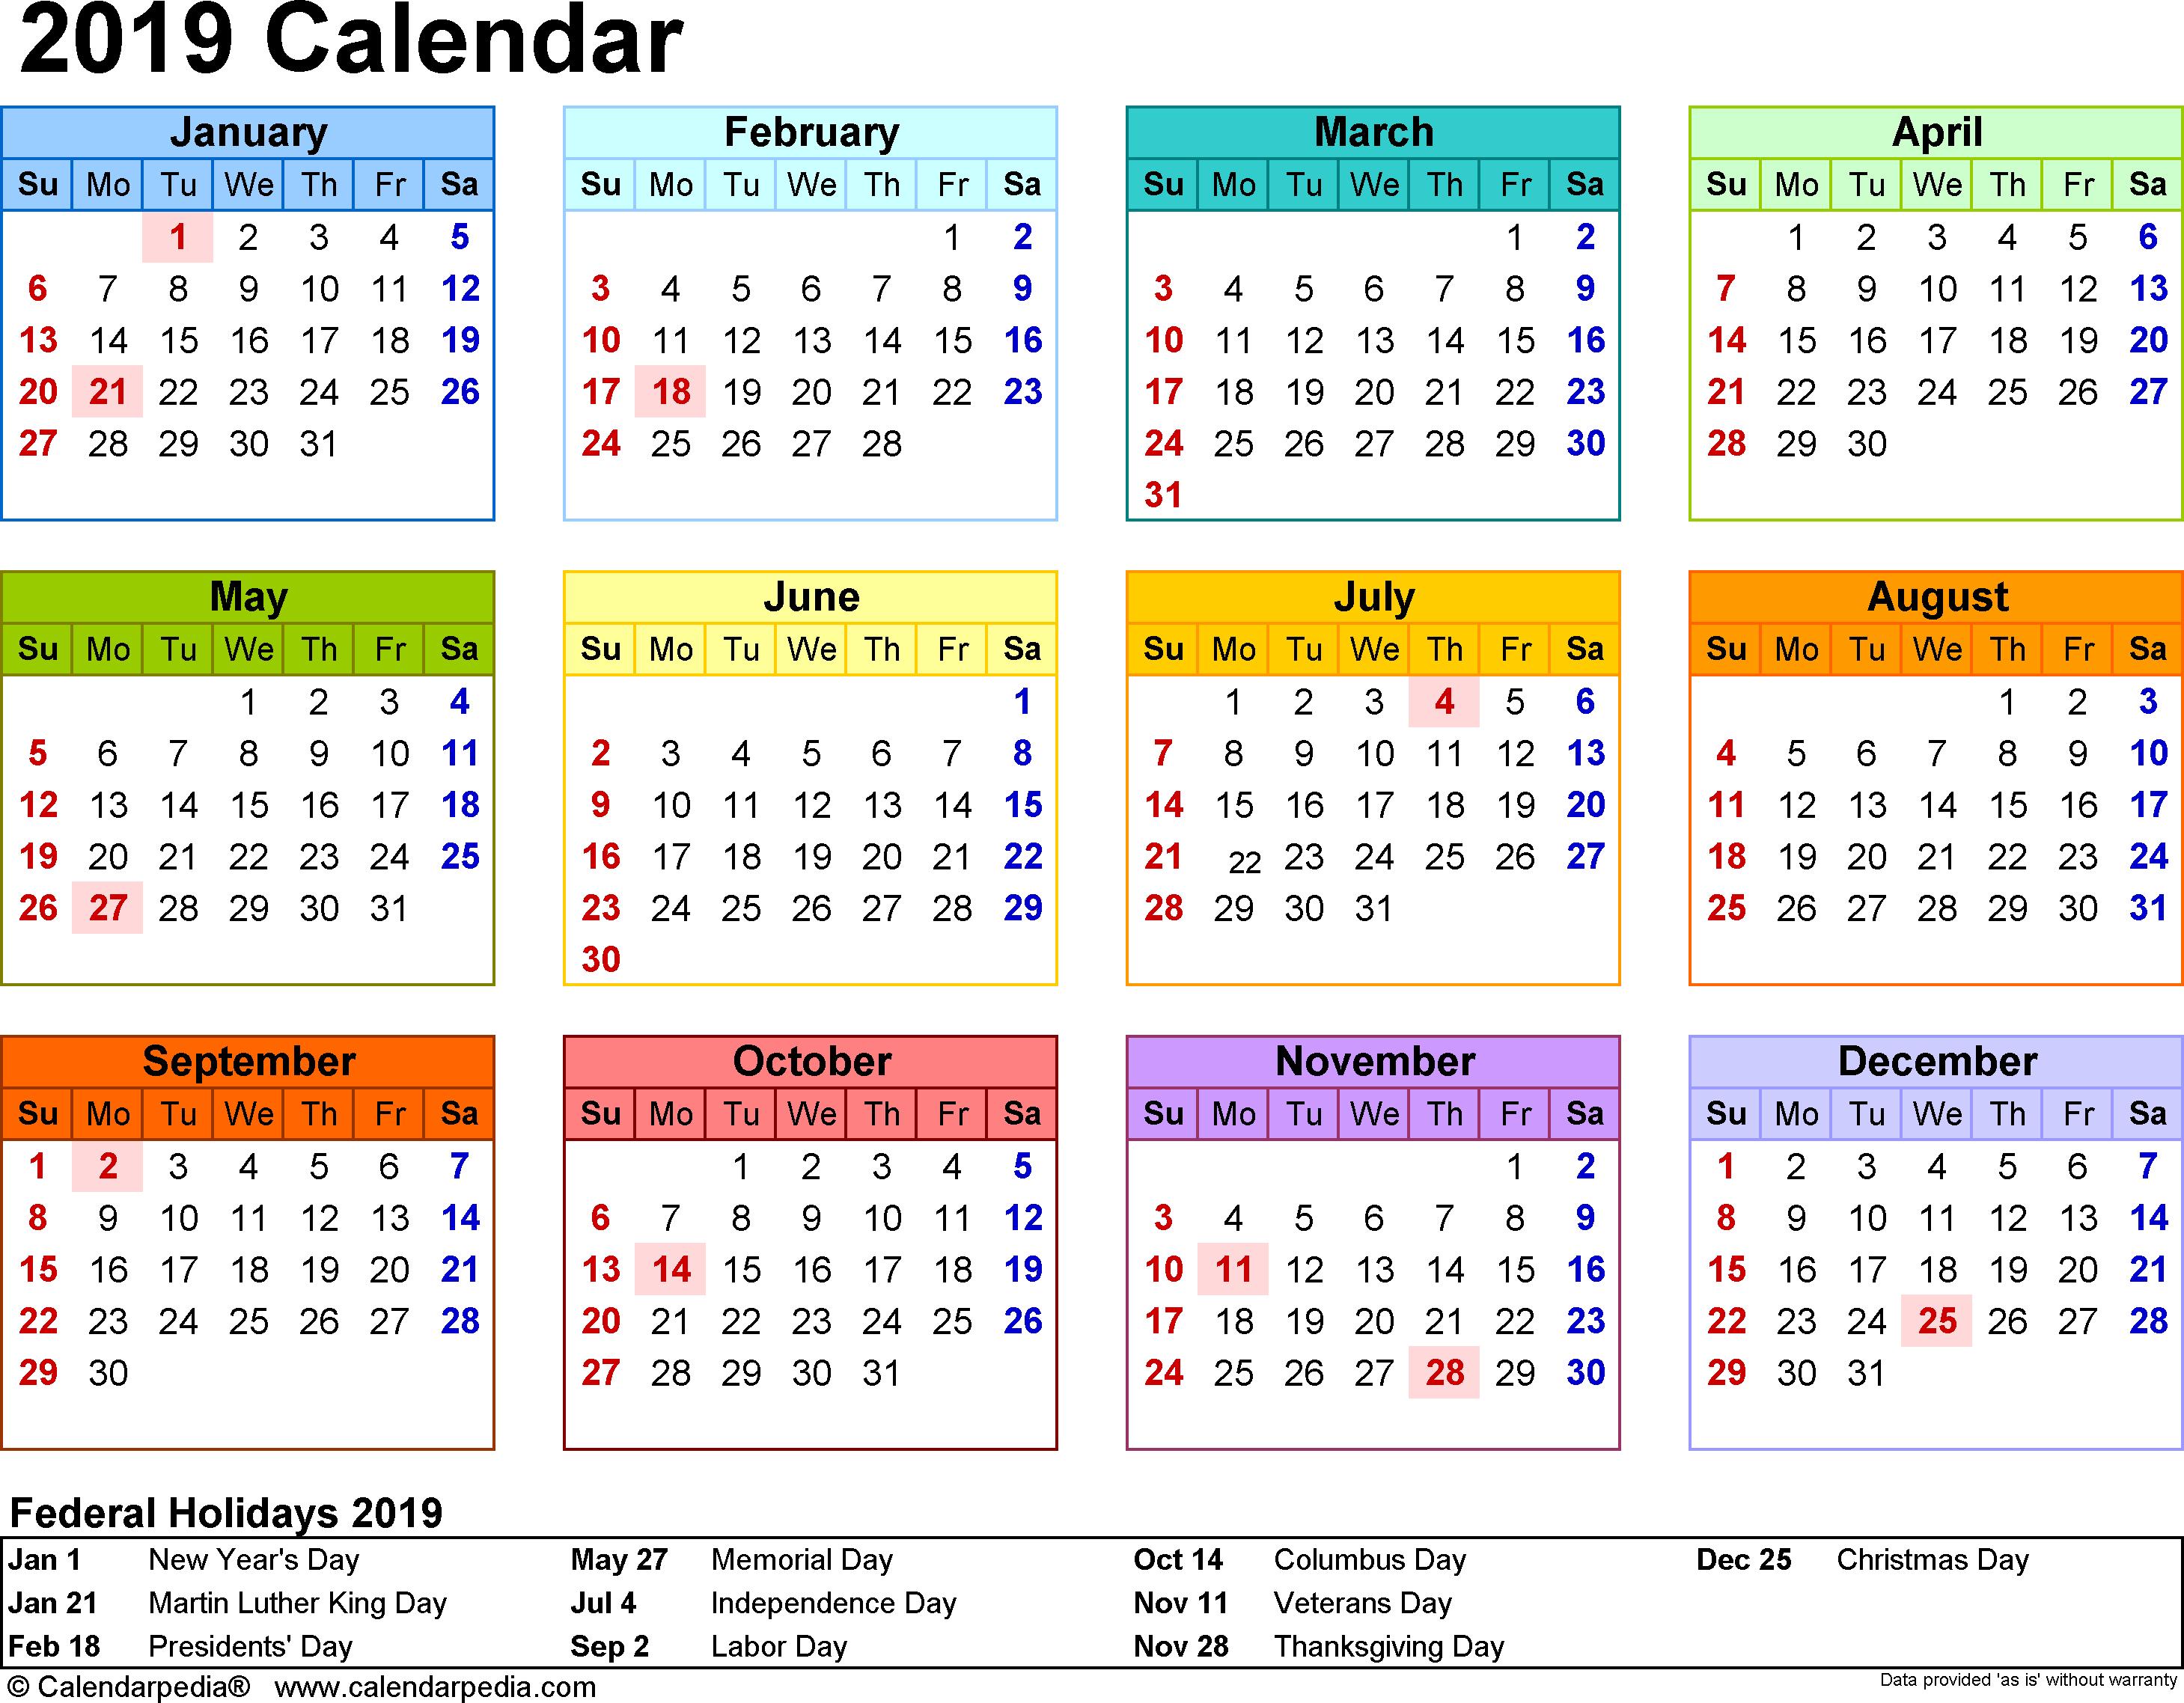 March 2019 Holiday Calendar Uk   2019 Calendars   Calendar